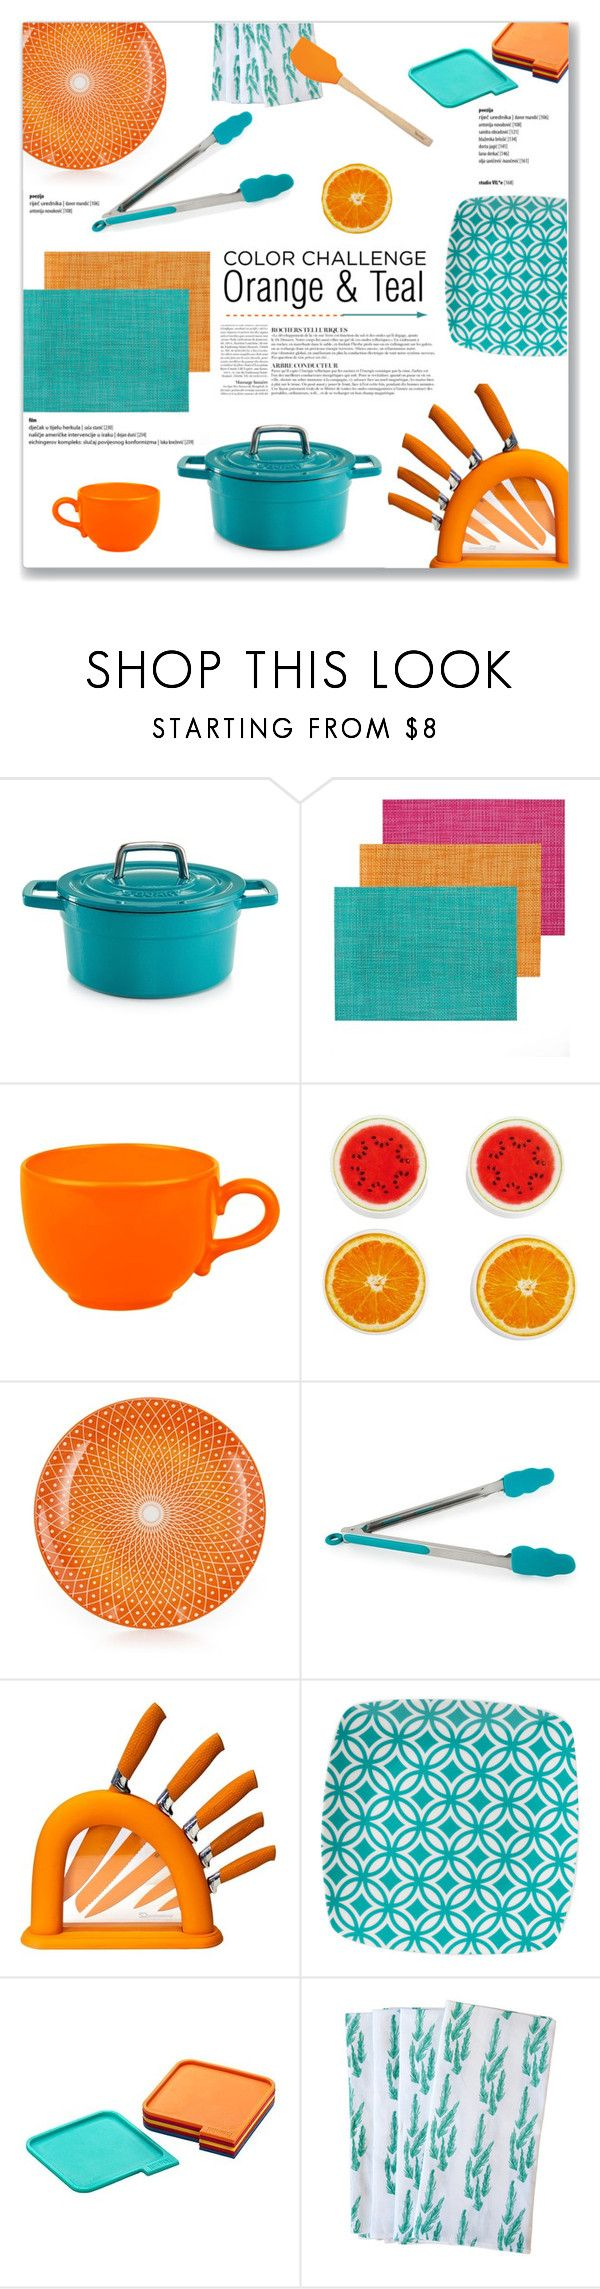 """Orange & Teal Kitchen Accessories"" by kellylynne68 ❤ liked on Polyvore featuring interior, interiors, interior design, home, home decor, interior decorating, Martha Stewart, Chilewich, Waechtersbach and Farberware"